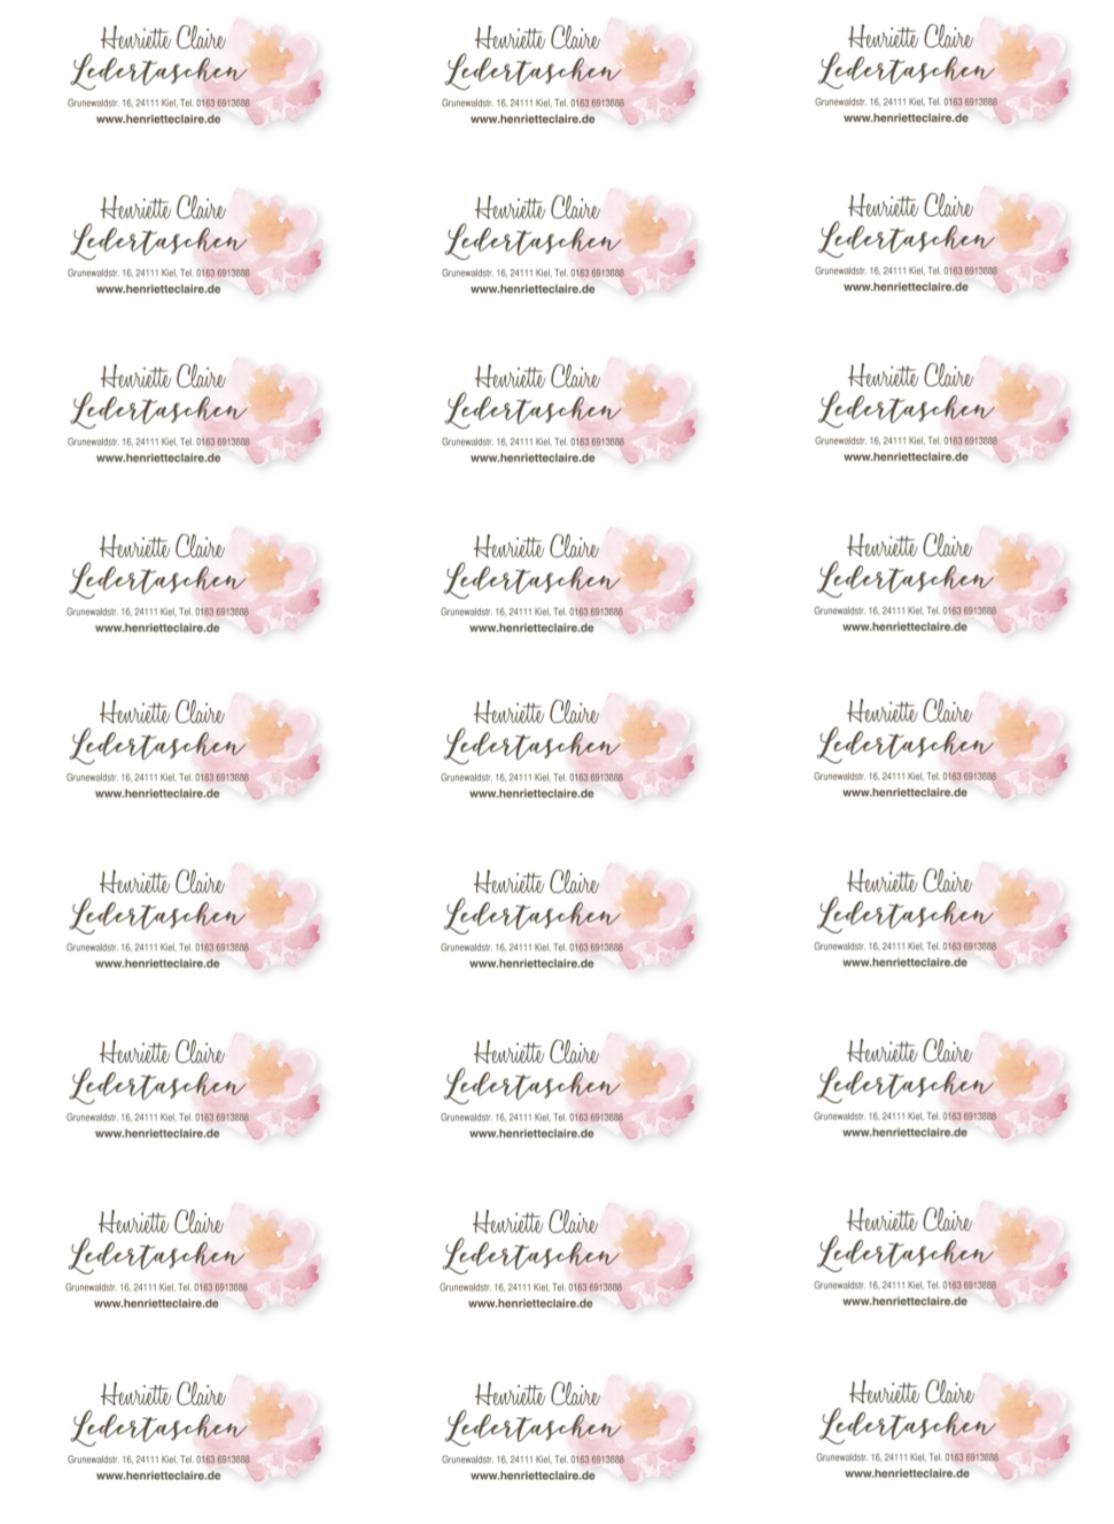 Henirette Claire Adressaufkleber rosa